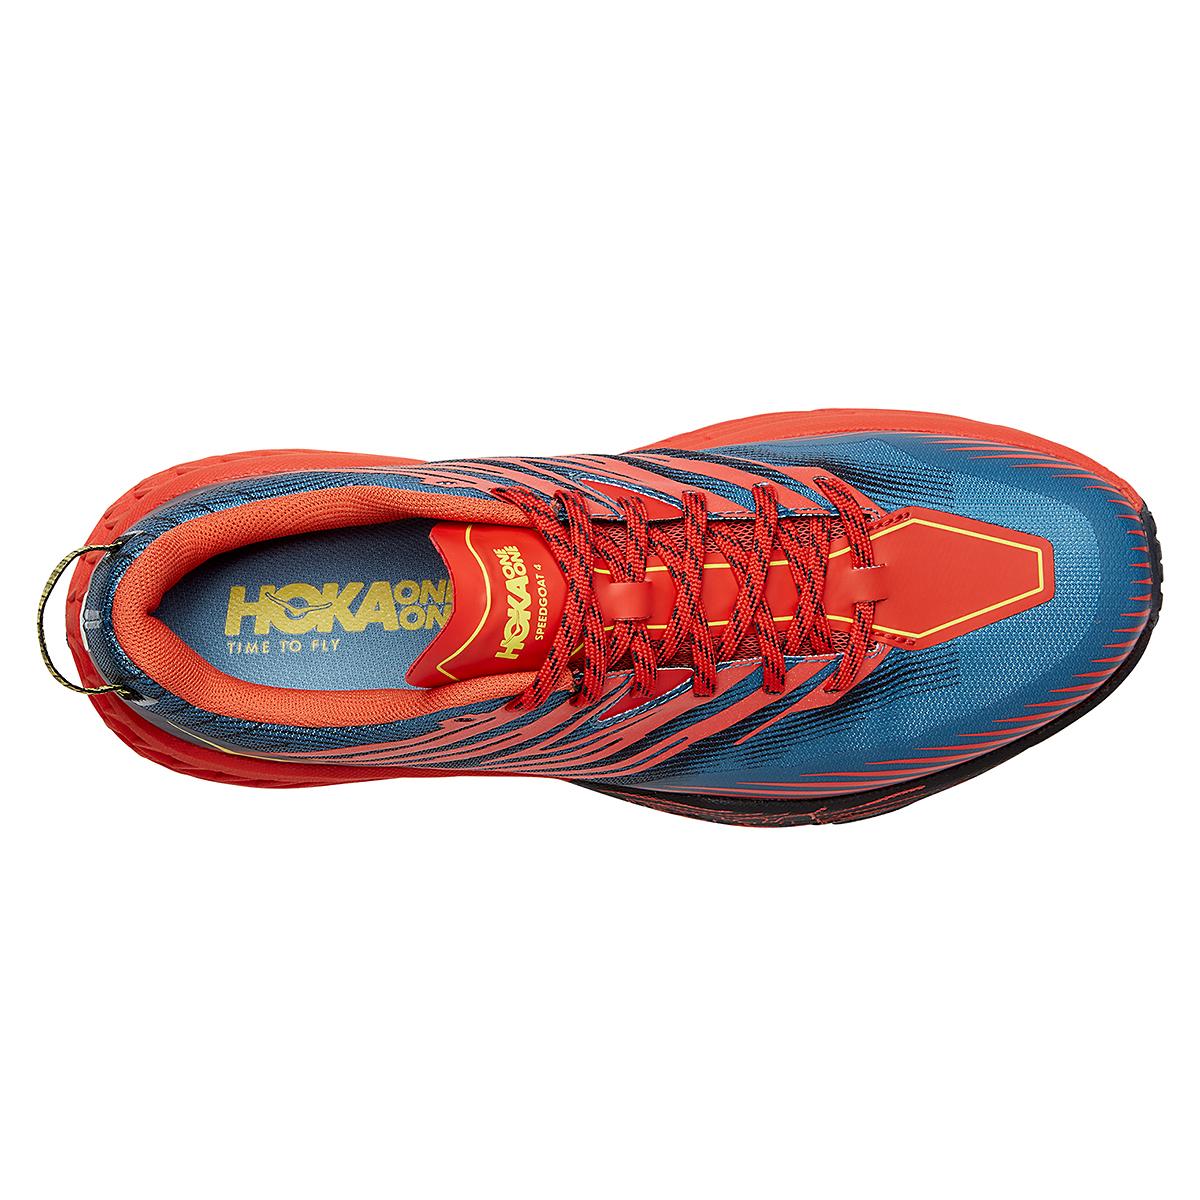 Men's Hoka One One Speedgoat 4 Trail Running Shoe, , large, image 2